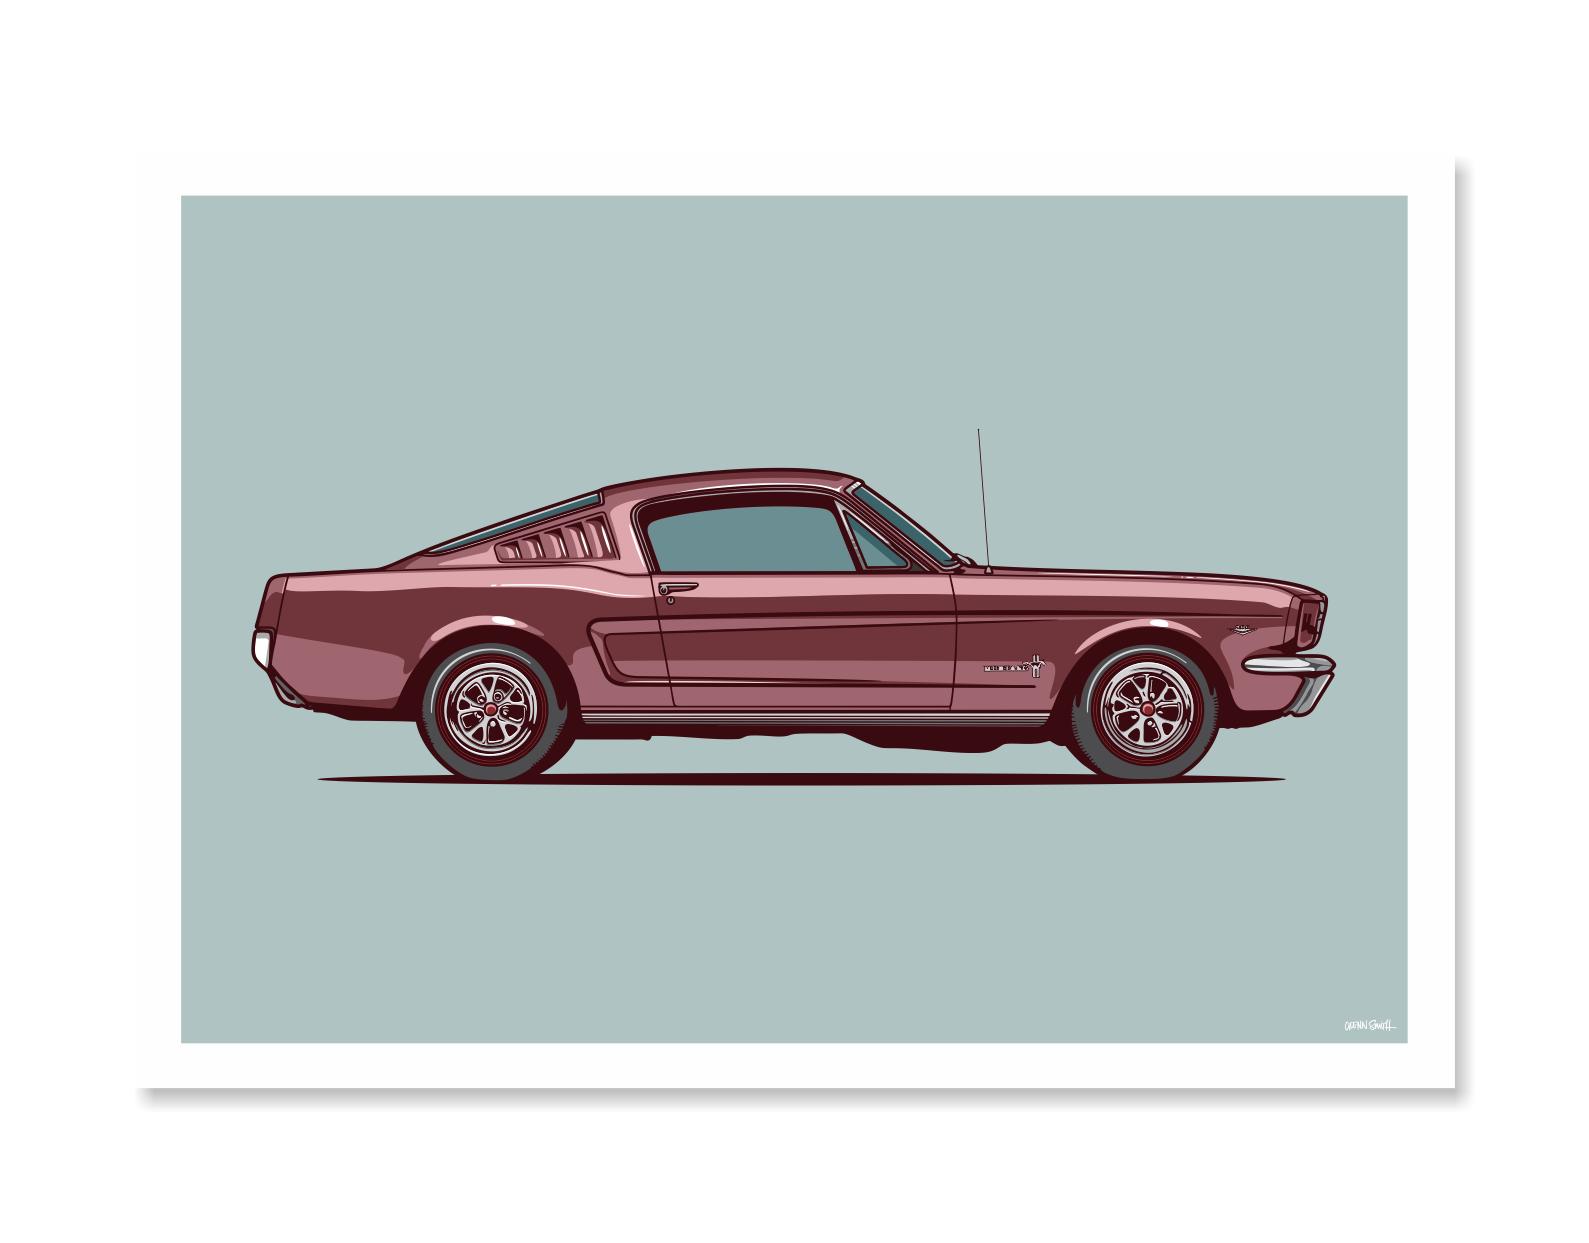 Ford Mustang Art Print Define Art Graphic Design Studio